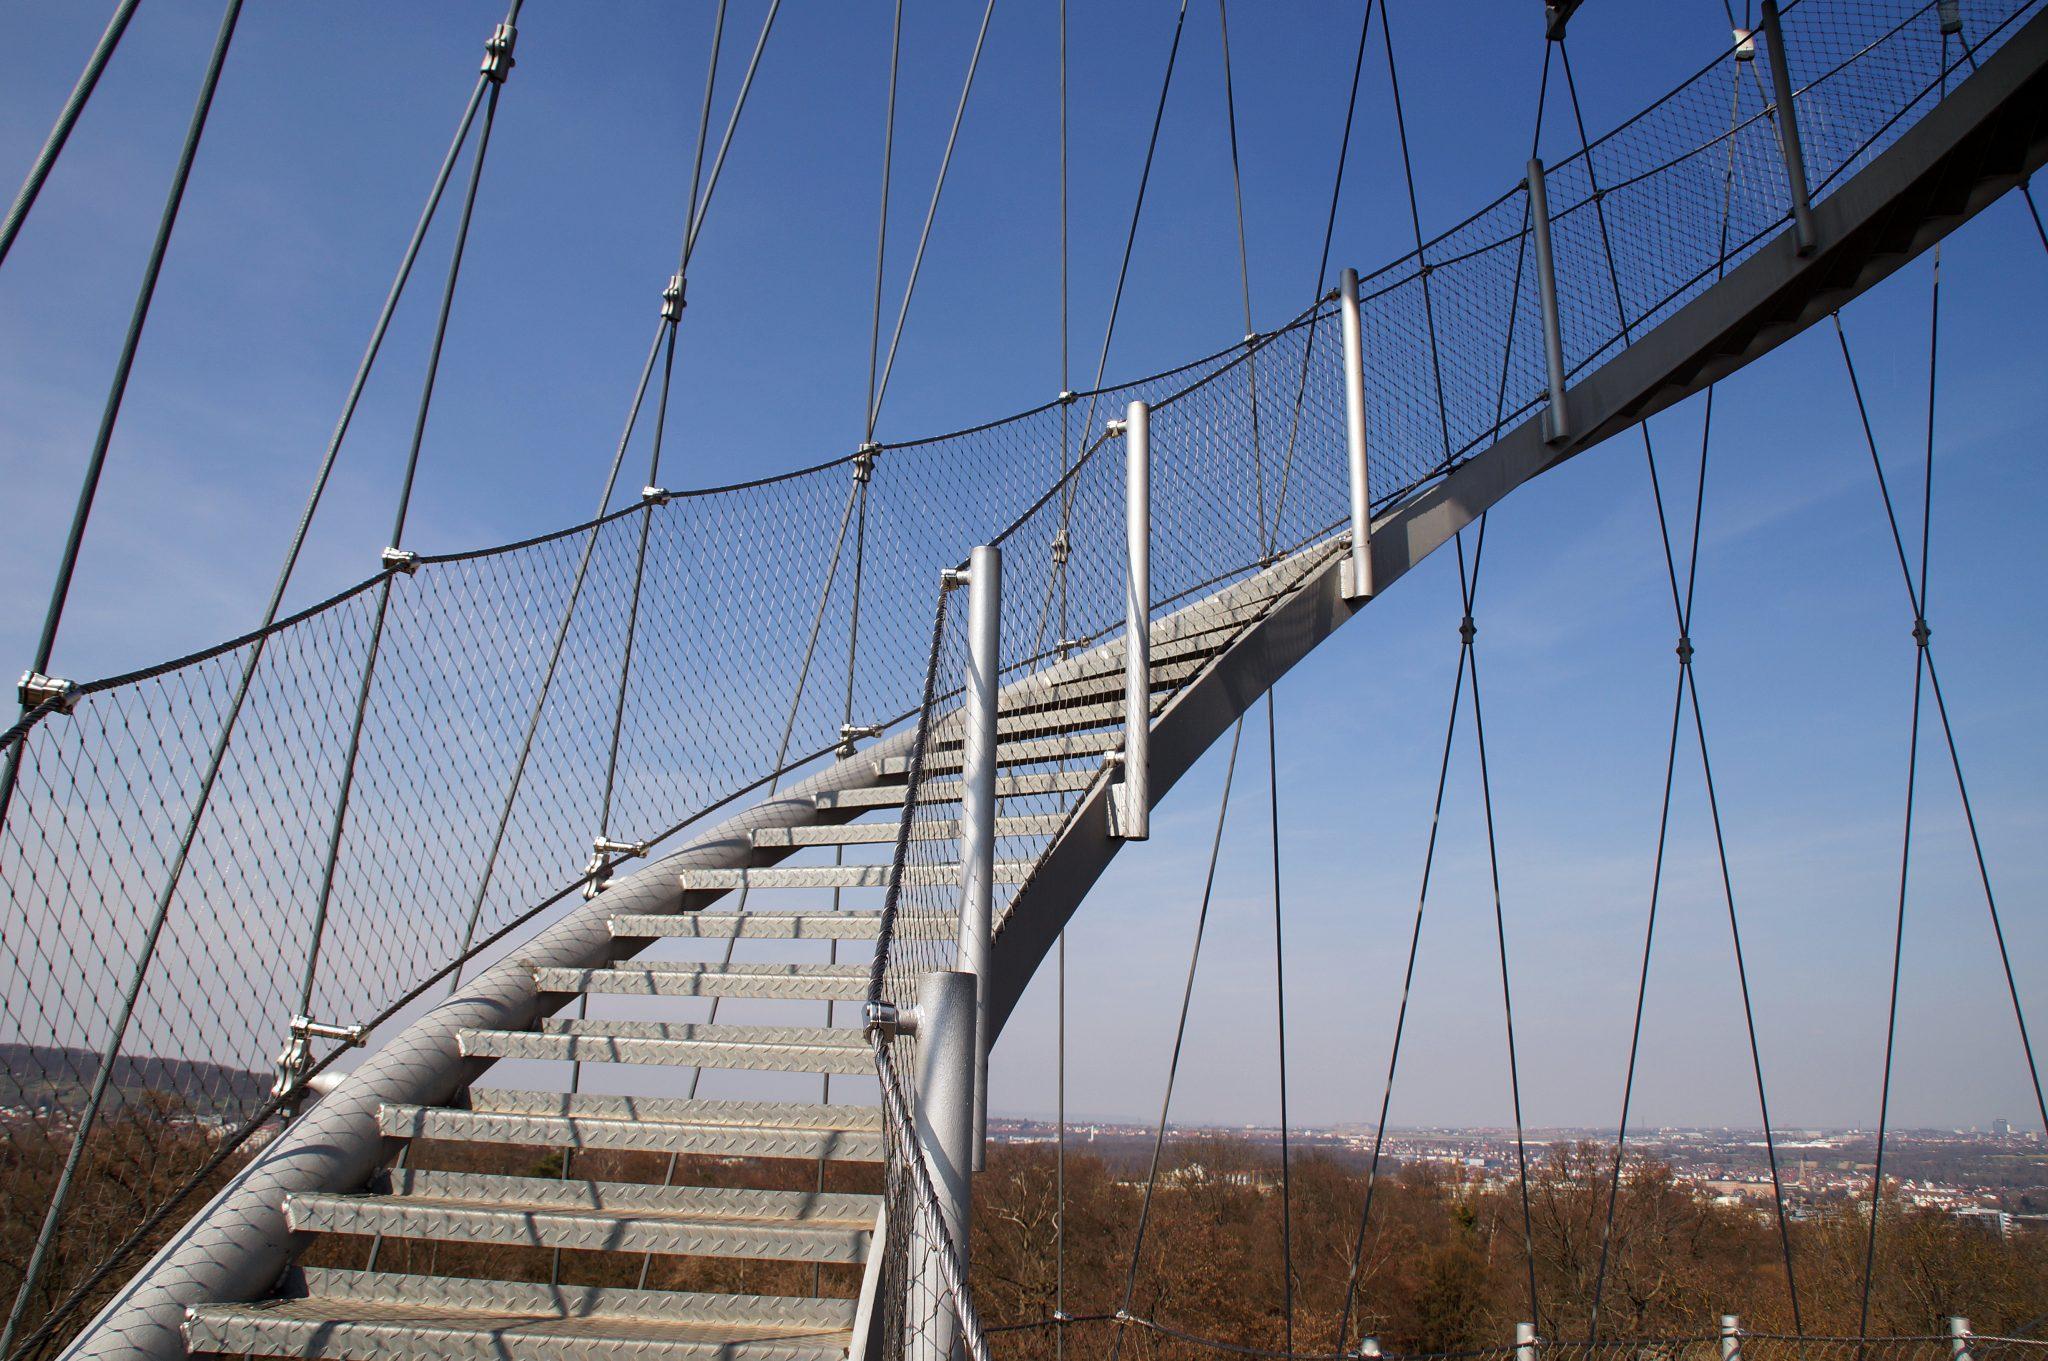 Aussichtsturm des Killesberg Parks in Stuttgart